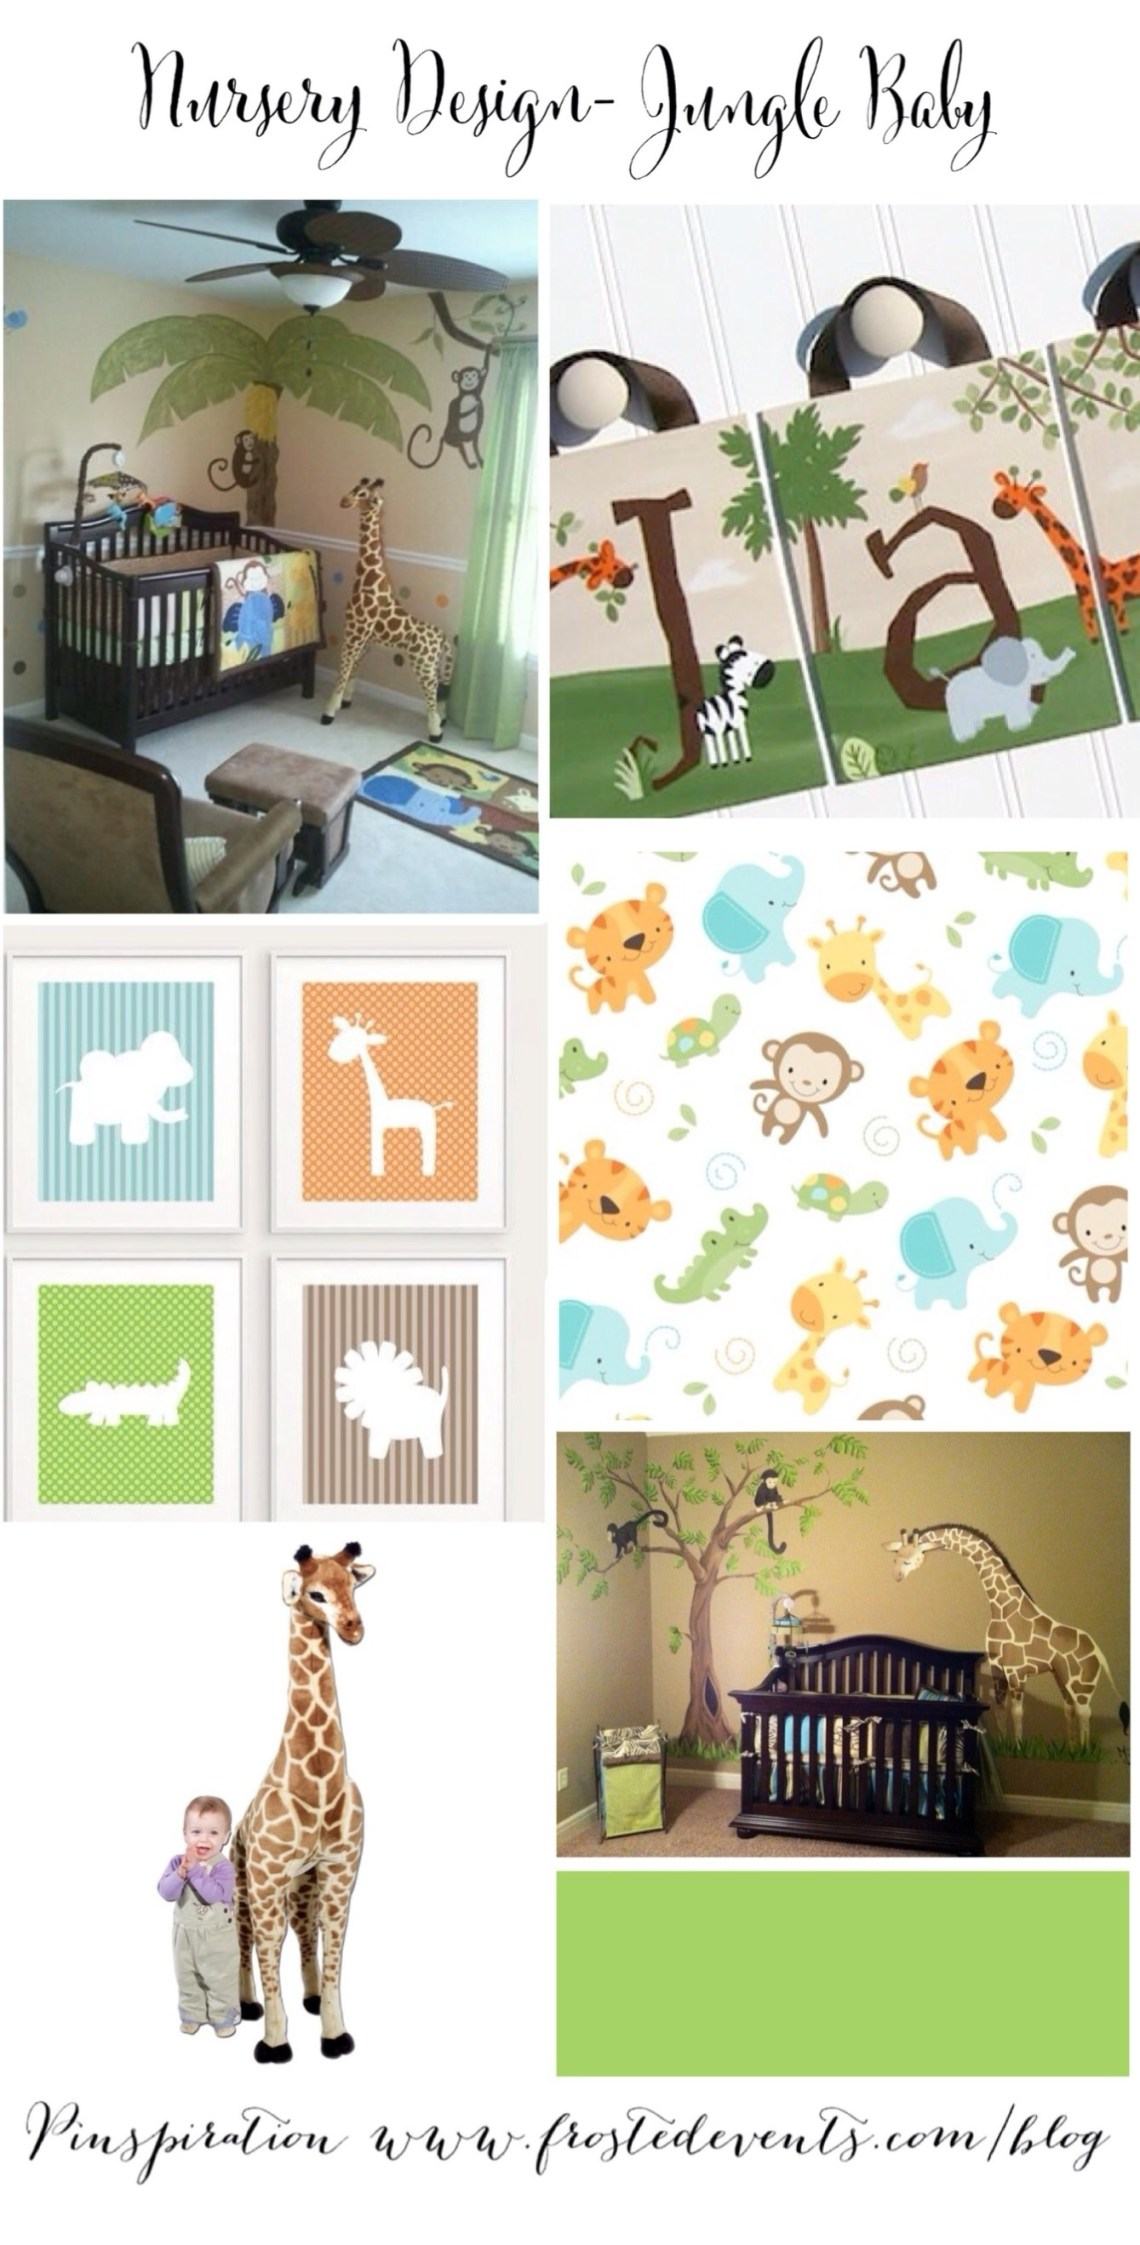 Nursery Design Jungle Baby www.frostedevents.com Ideas & Inspiration